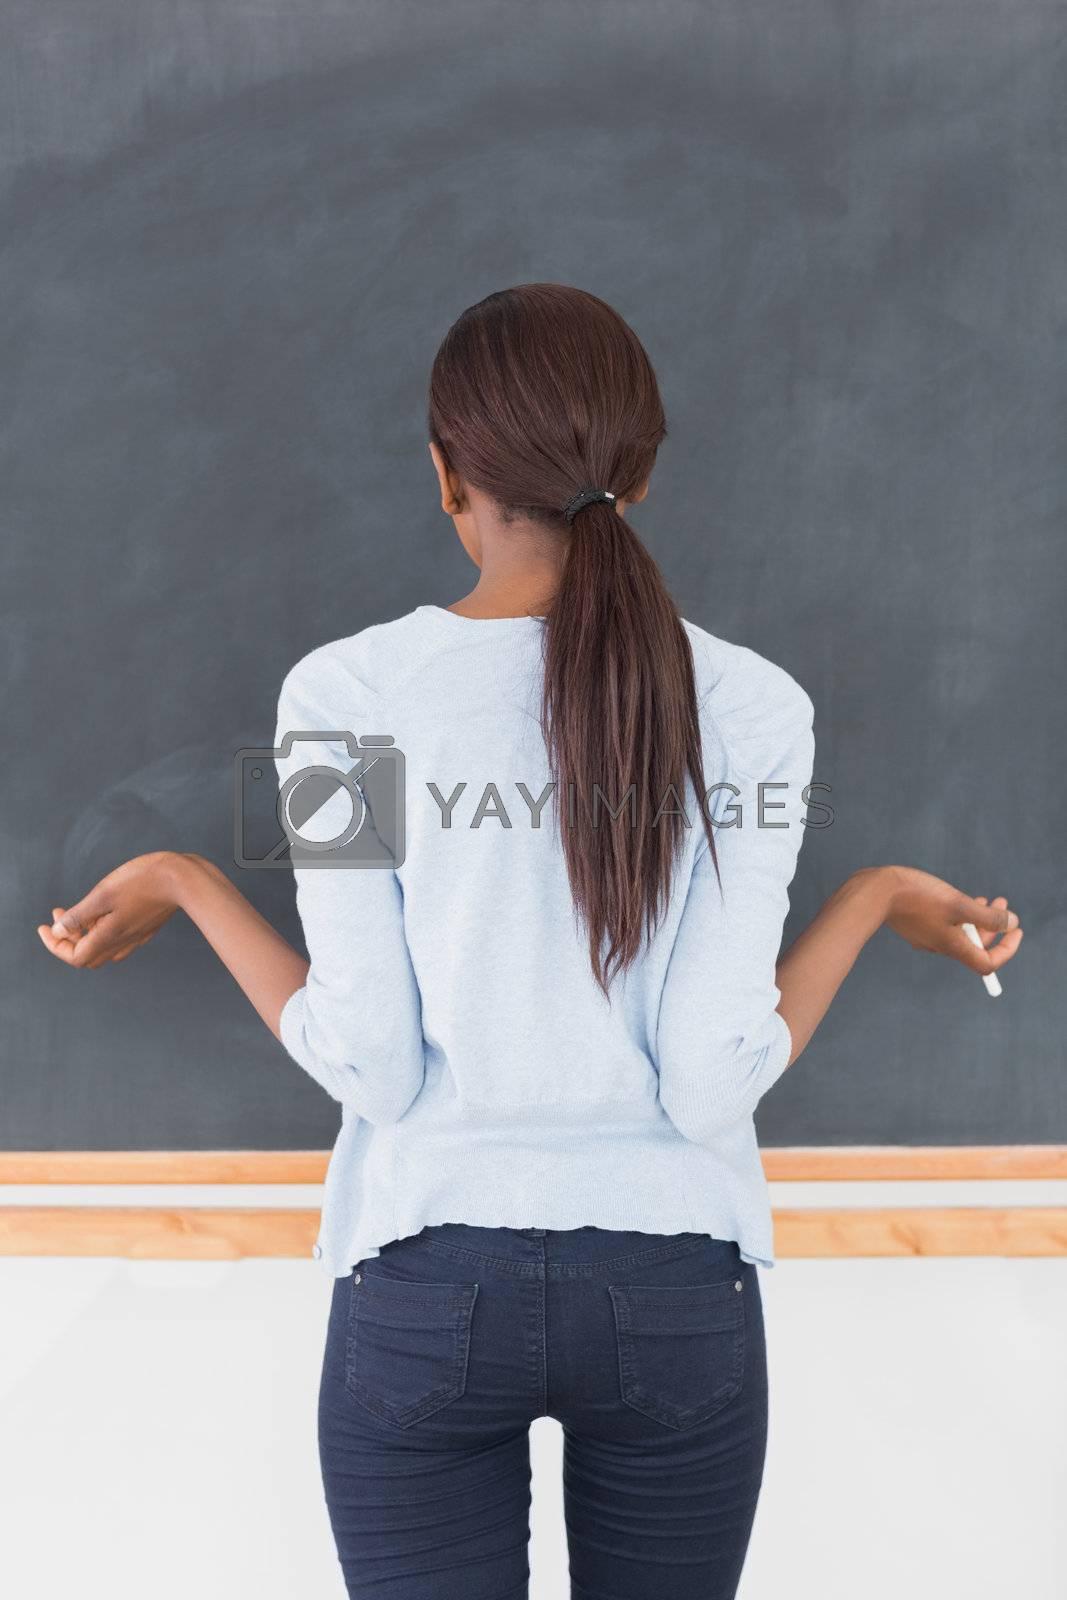 Black woman seeming uncertain in a classroom